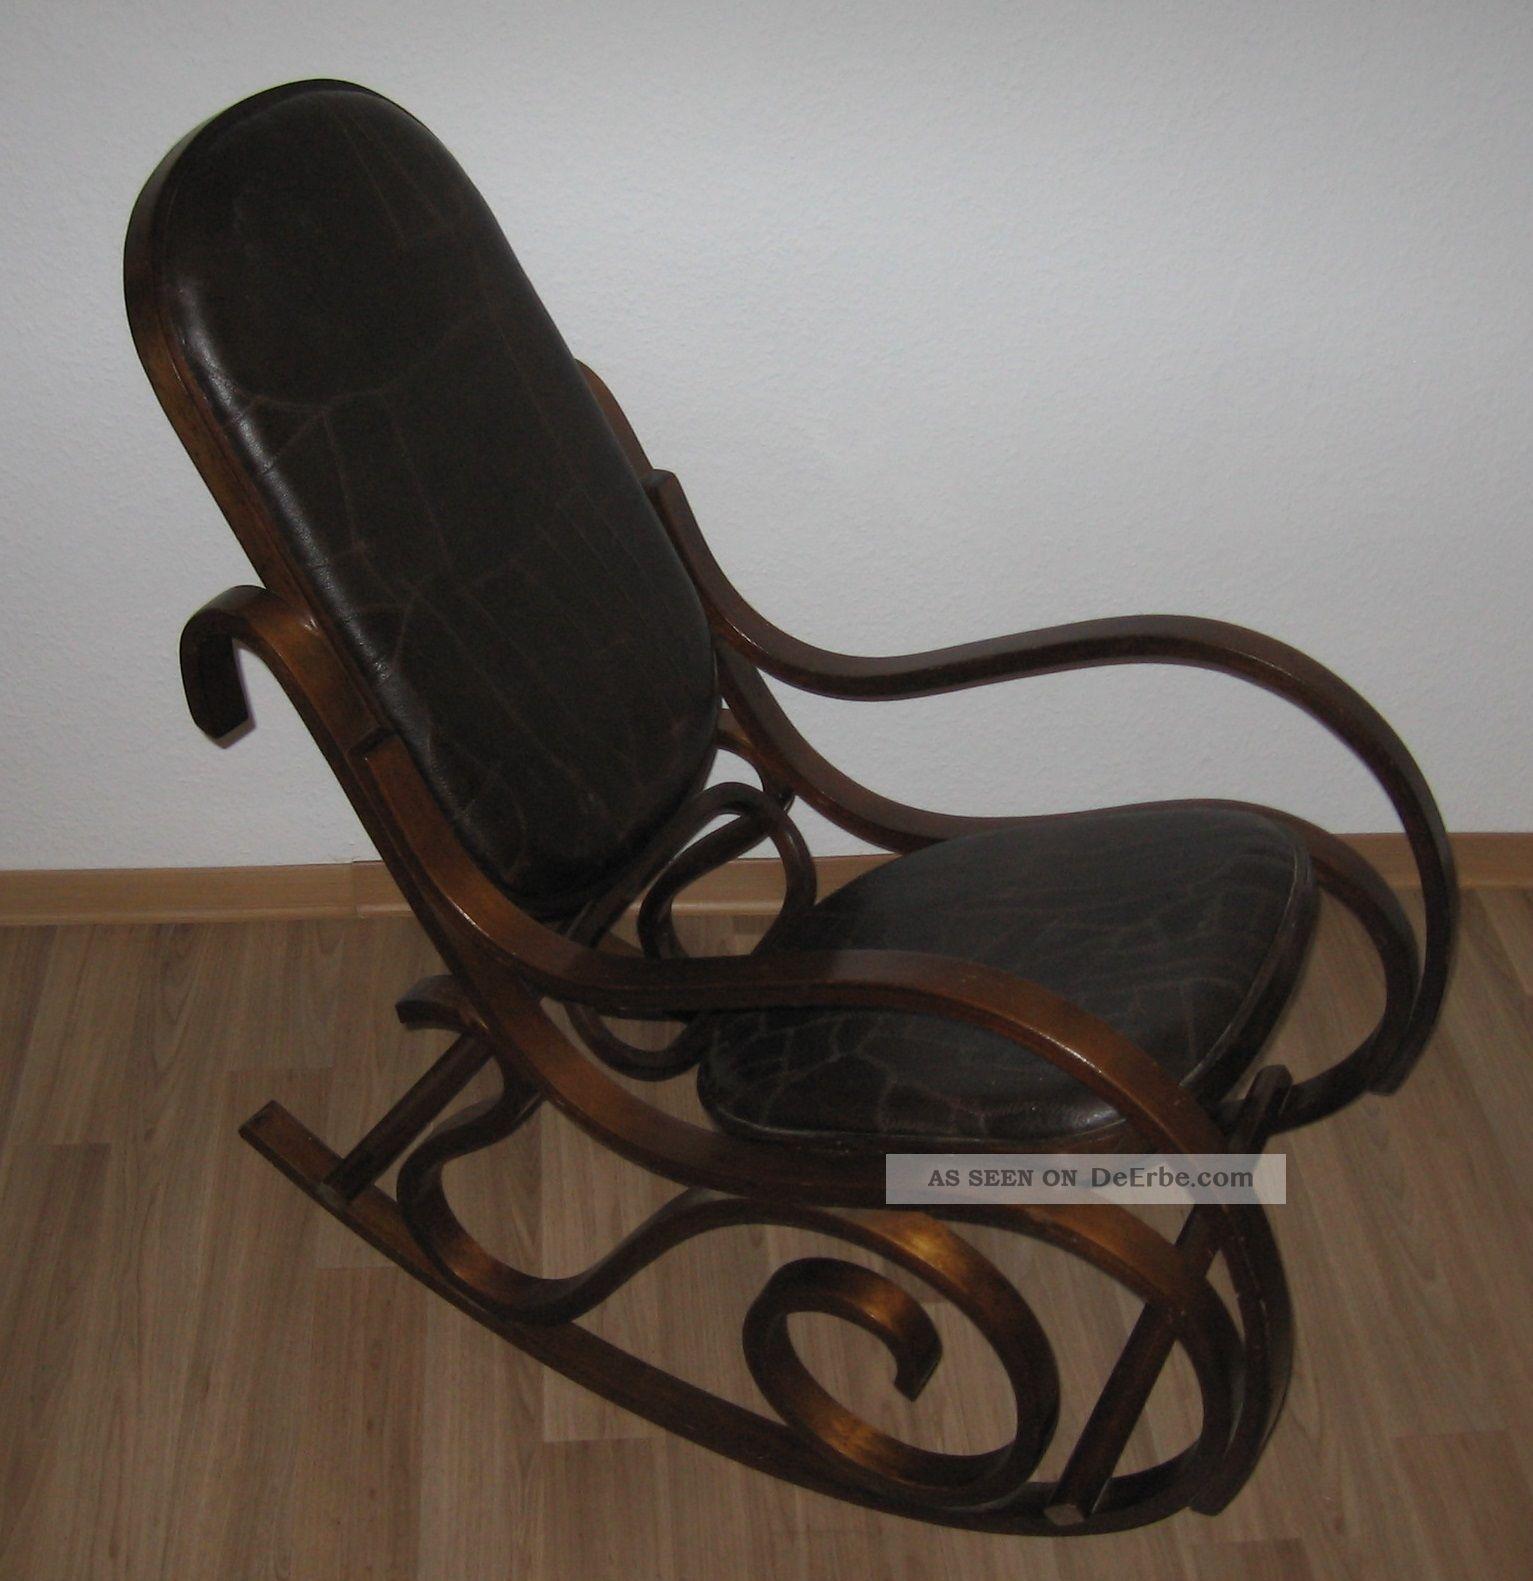 Schaukelstuhl schwingsessel stuhl relaxsessel standort for Schaukelstuhl 1900